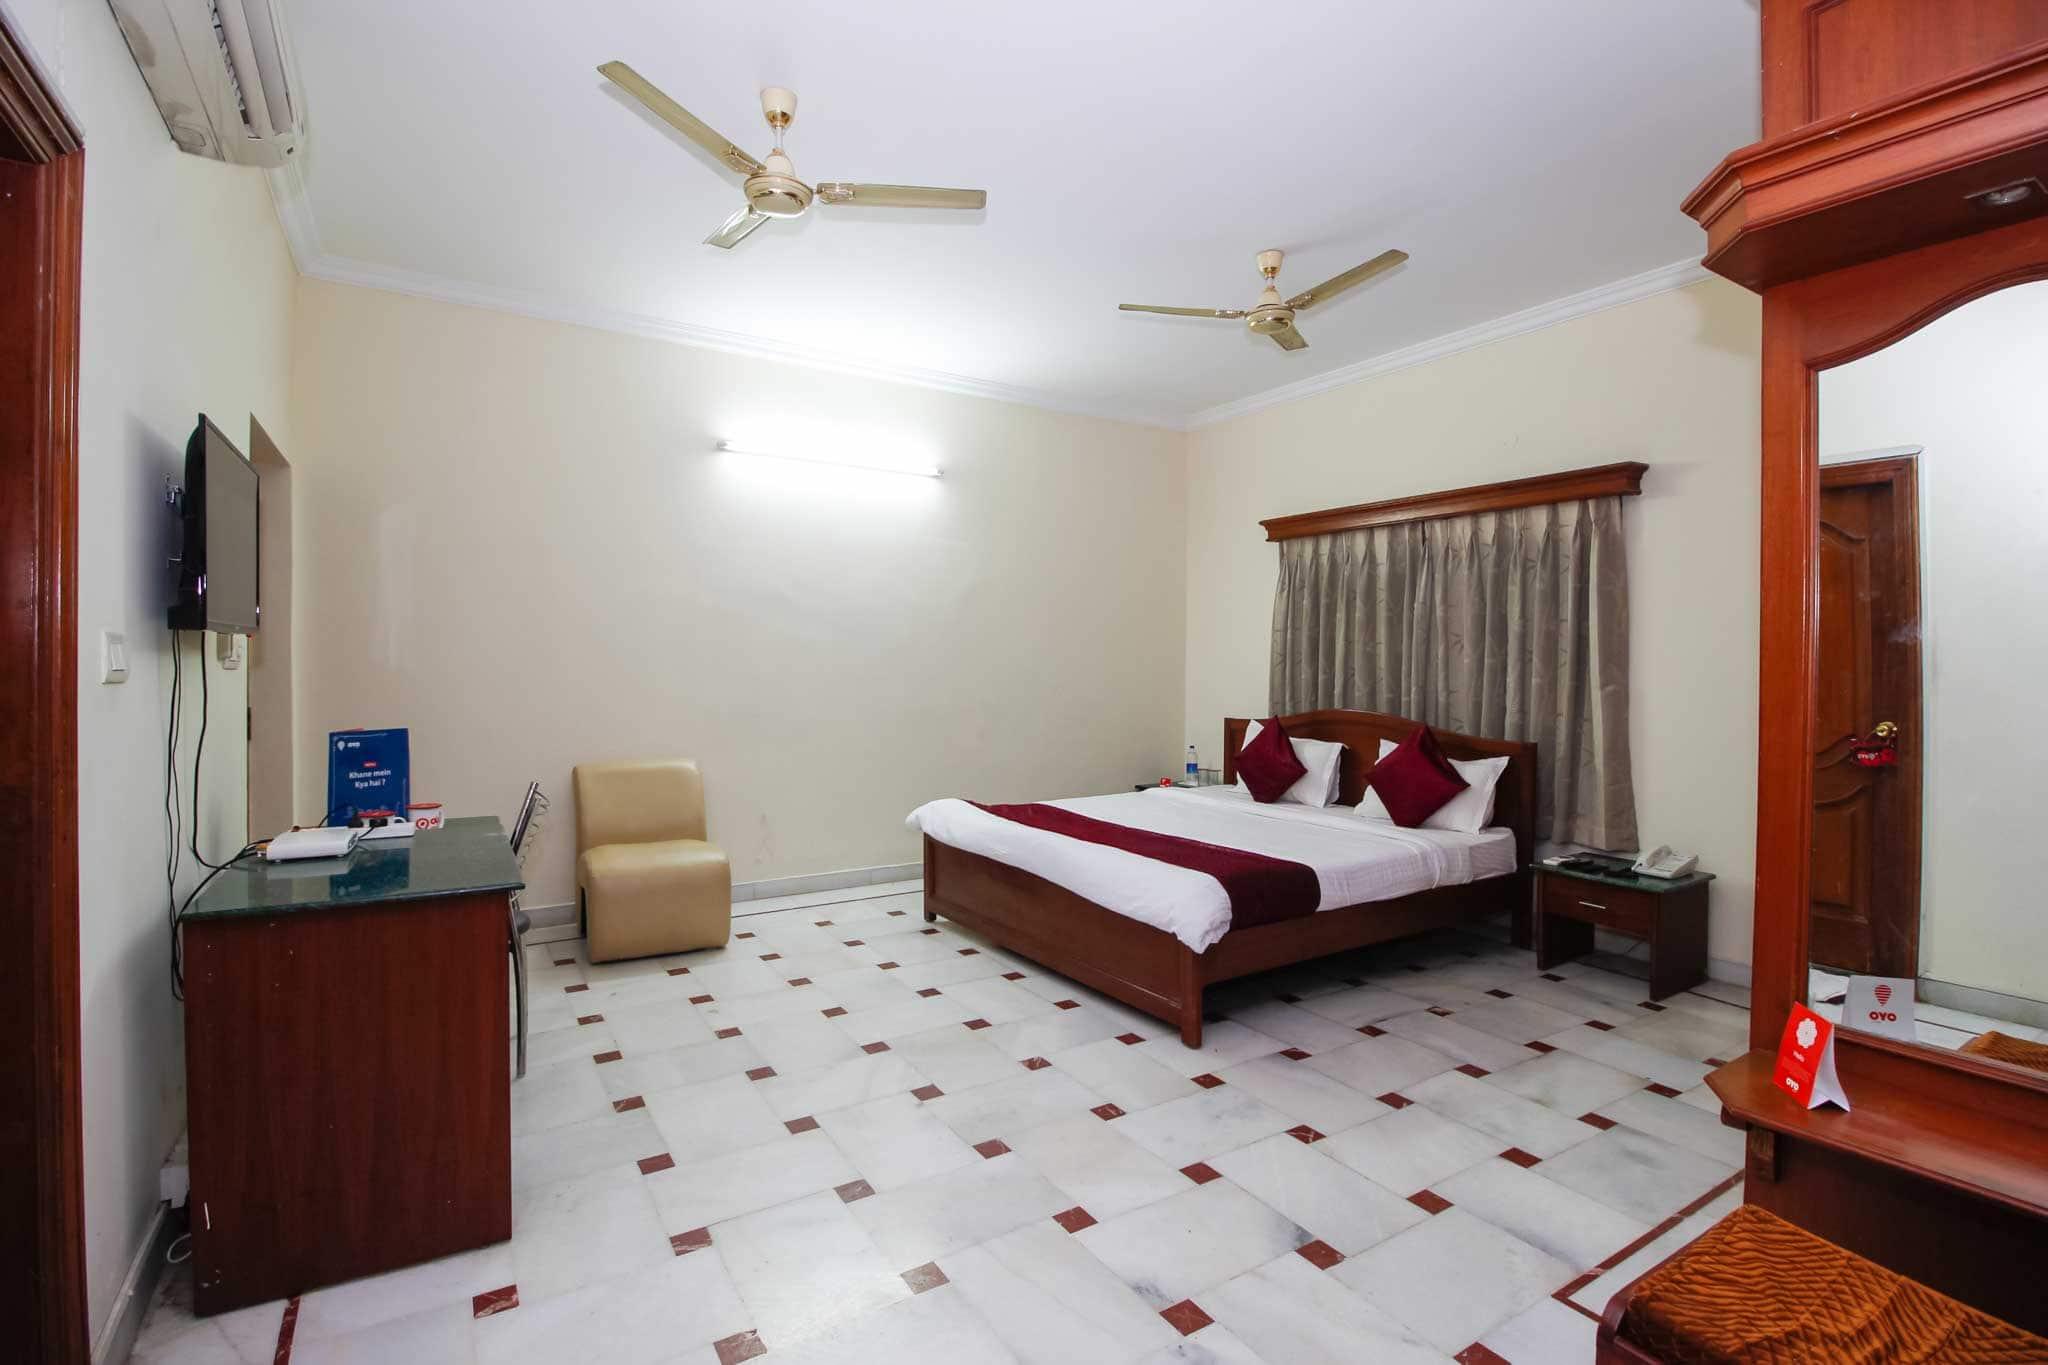 OYO 4048 Apartment Alpine Glow Crest in Akbarnagar